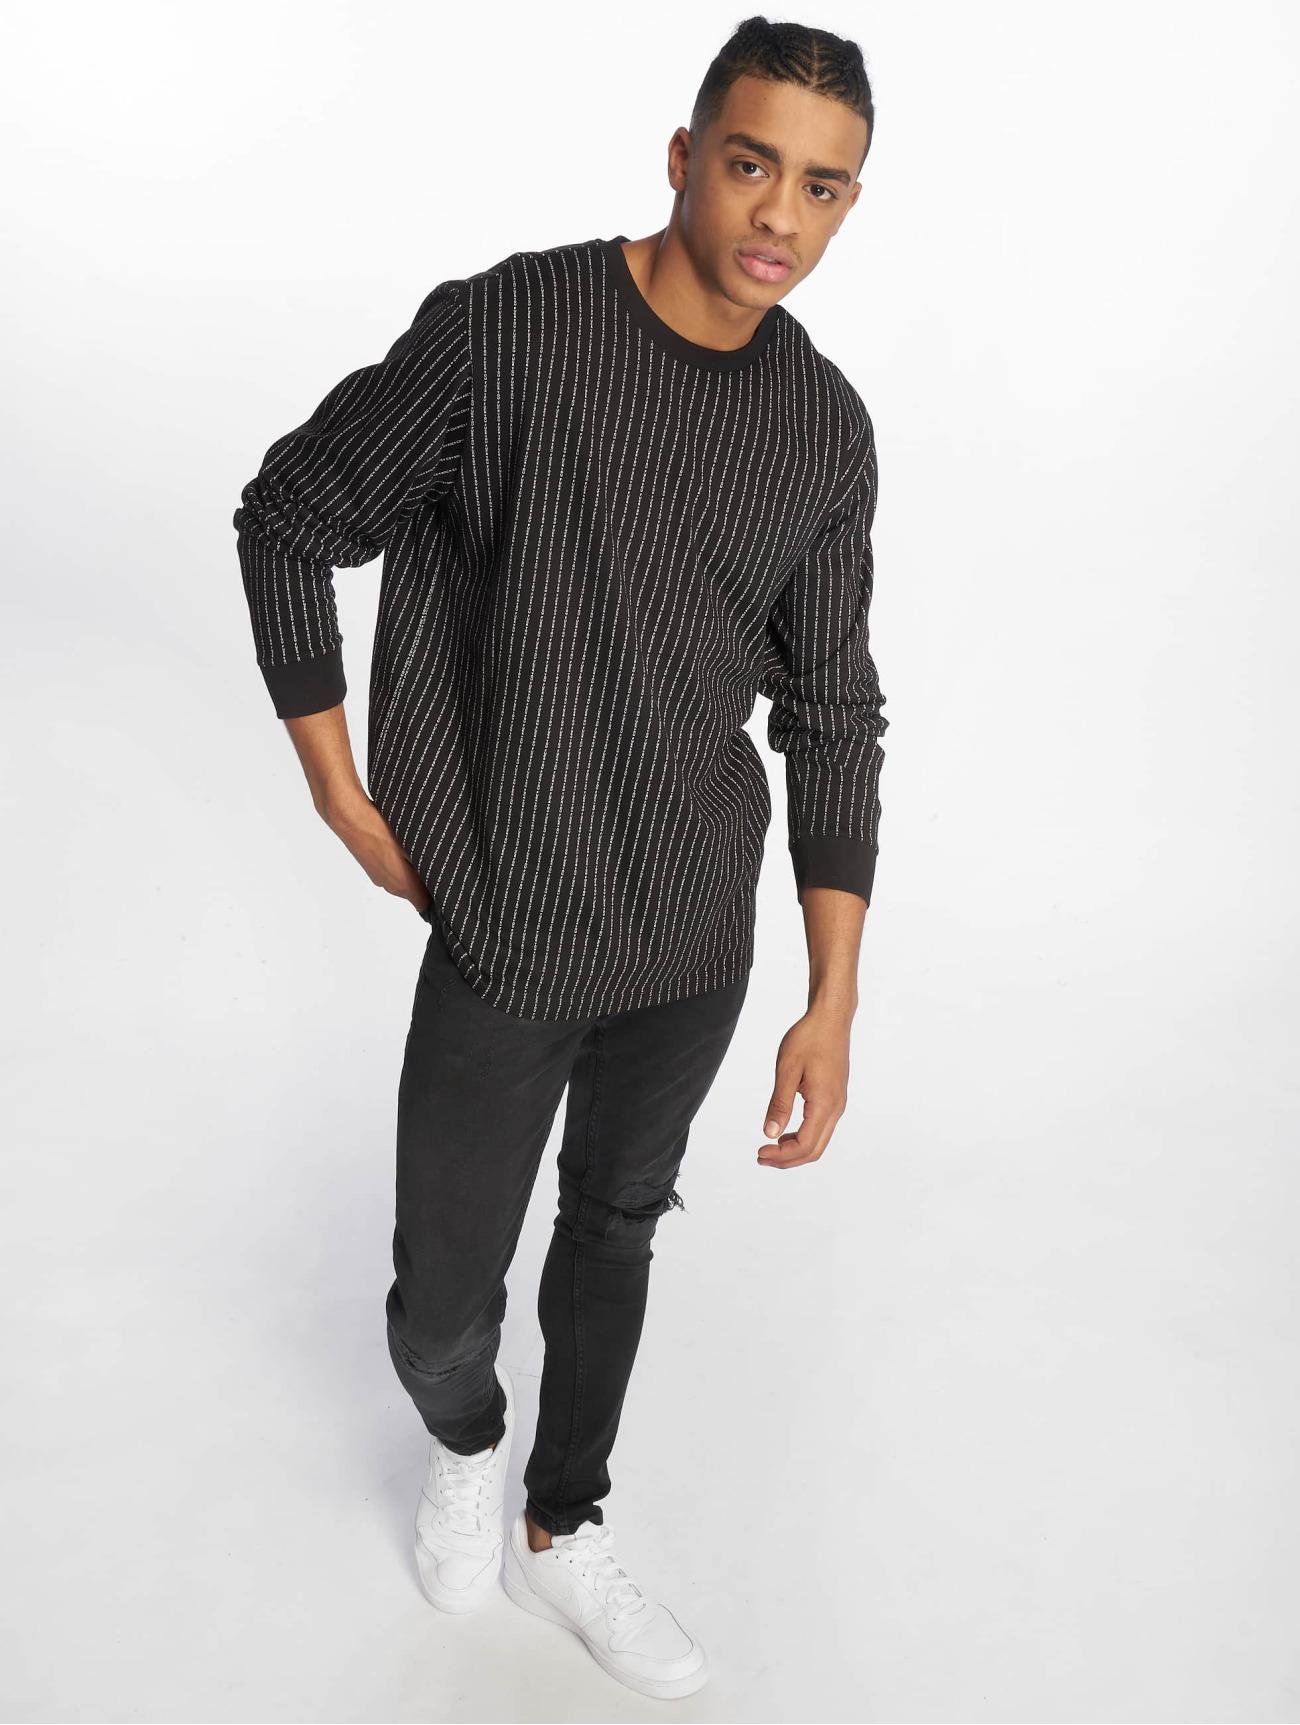 Mister Tee | Fuckyou  noir Homme T-Shirt manches longues  587915| Homme Hauts